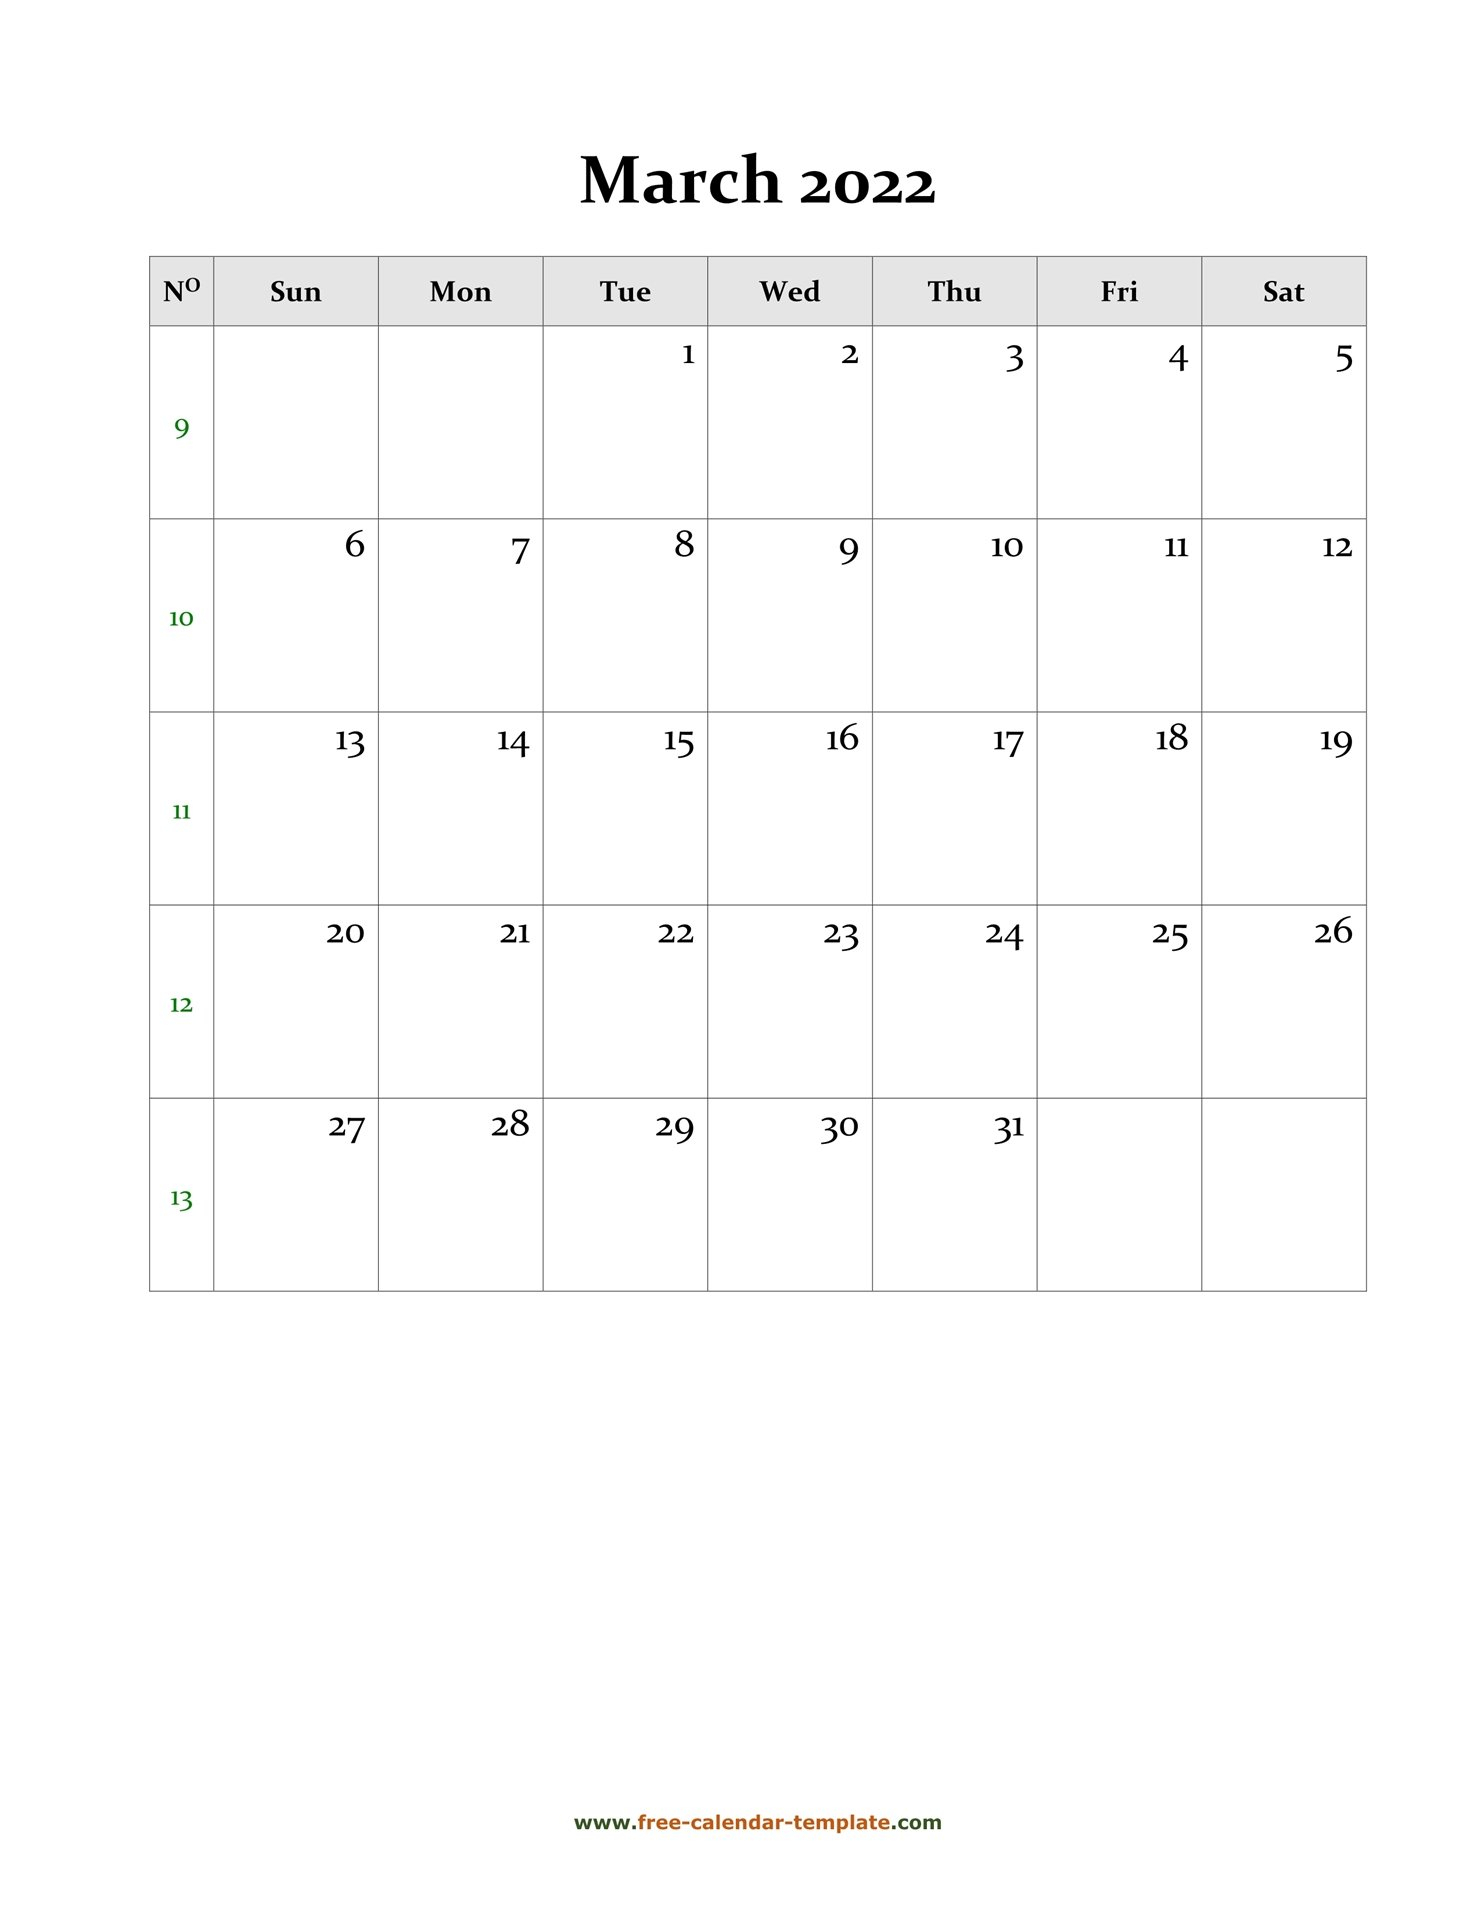 2022 March Calendar (Blank Vertical Template) | Free with regard to March 2022 Calendar Template Image